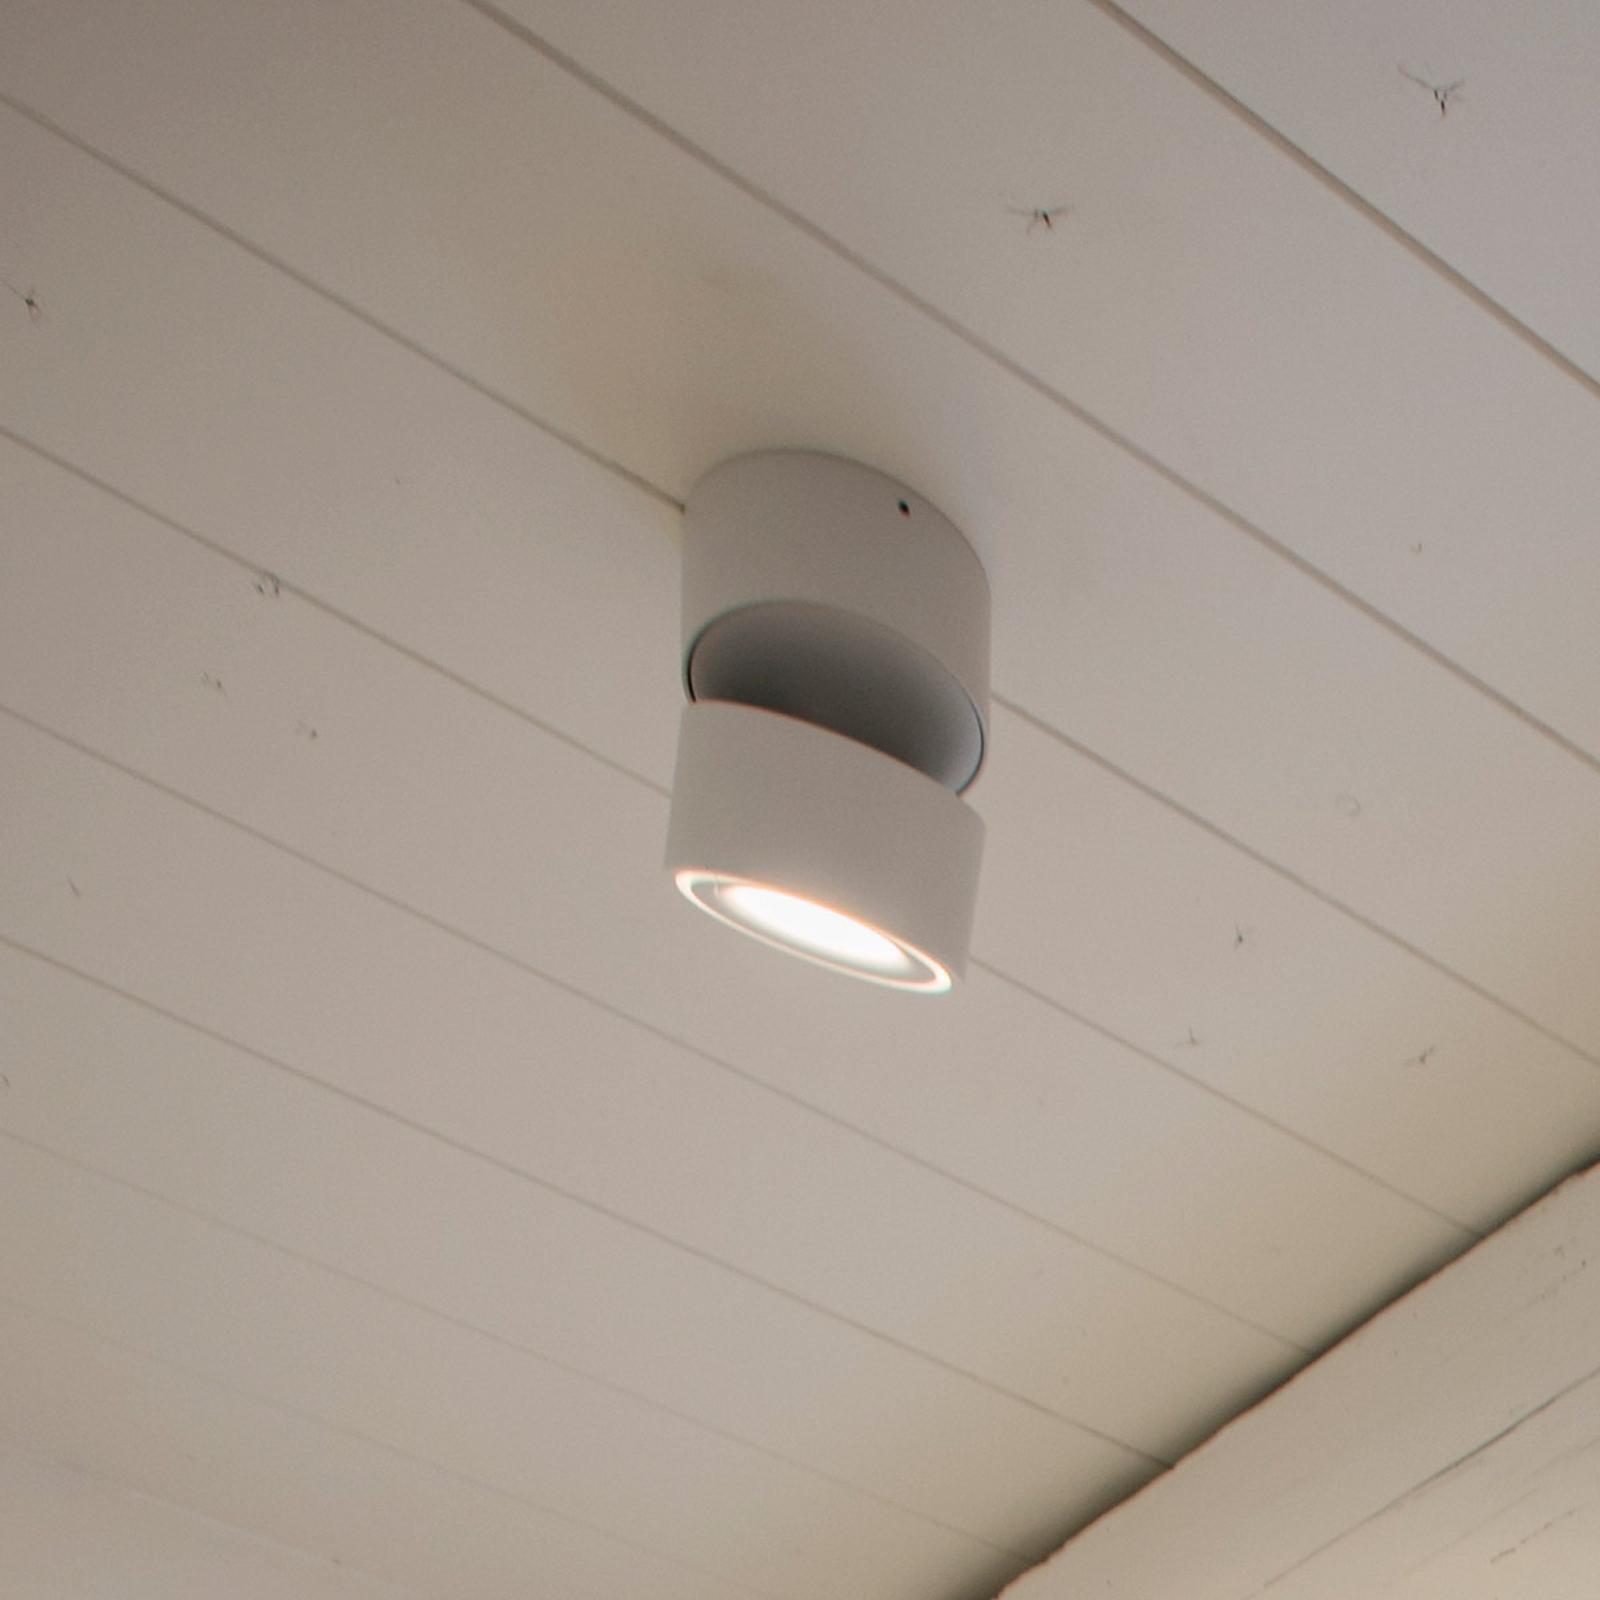 Egger Clippo LED-Deckenspot dim-to-warm weiß